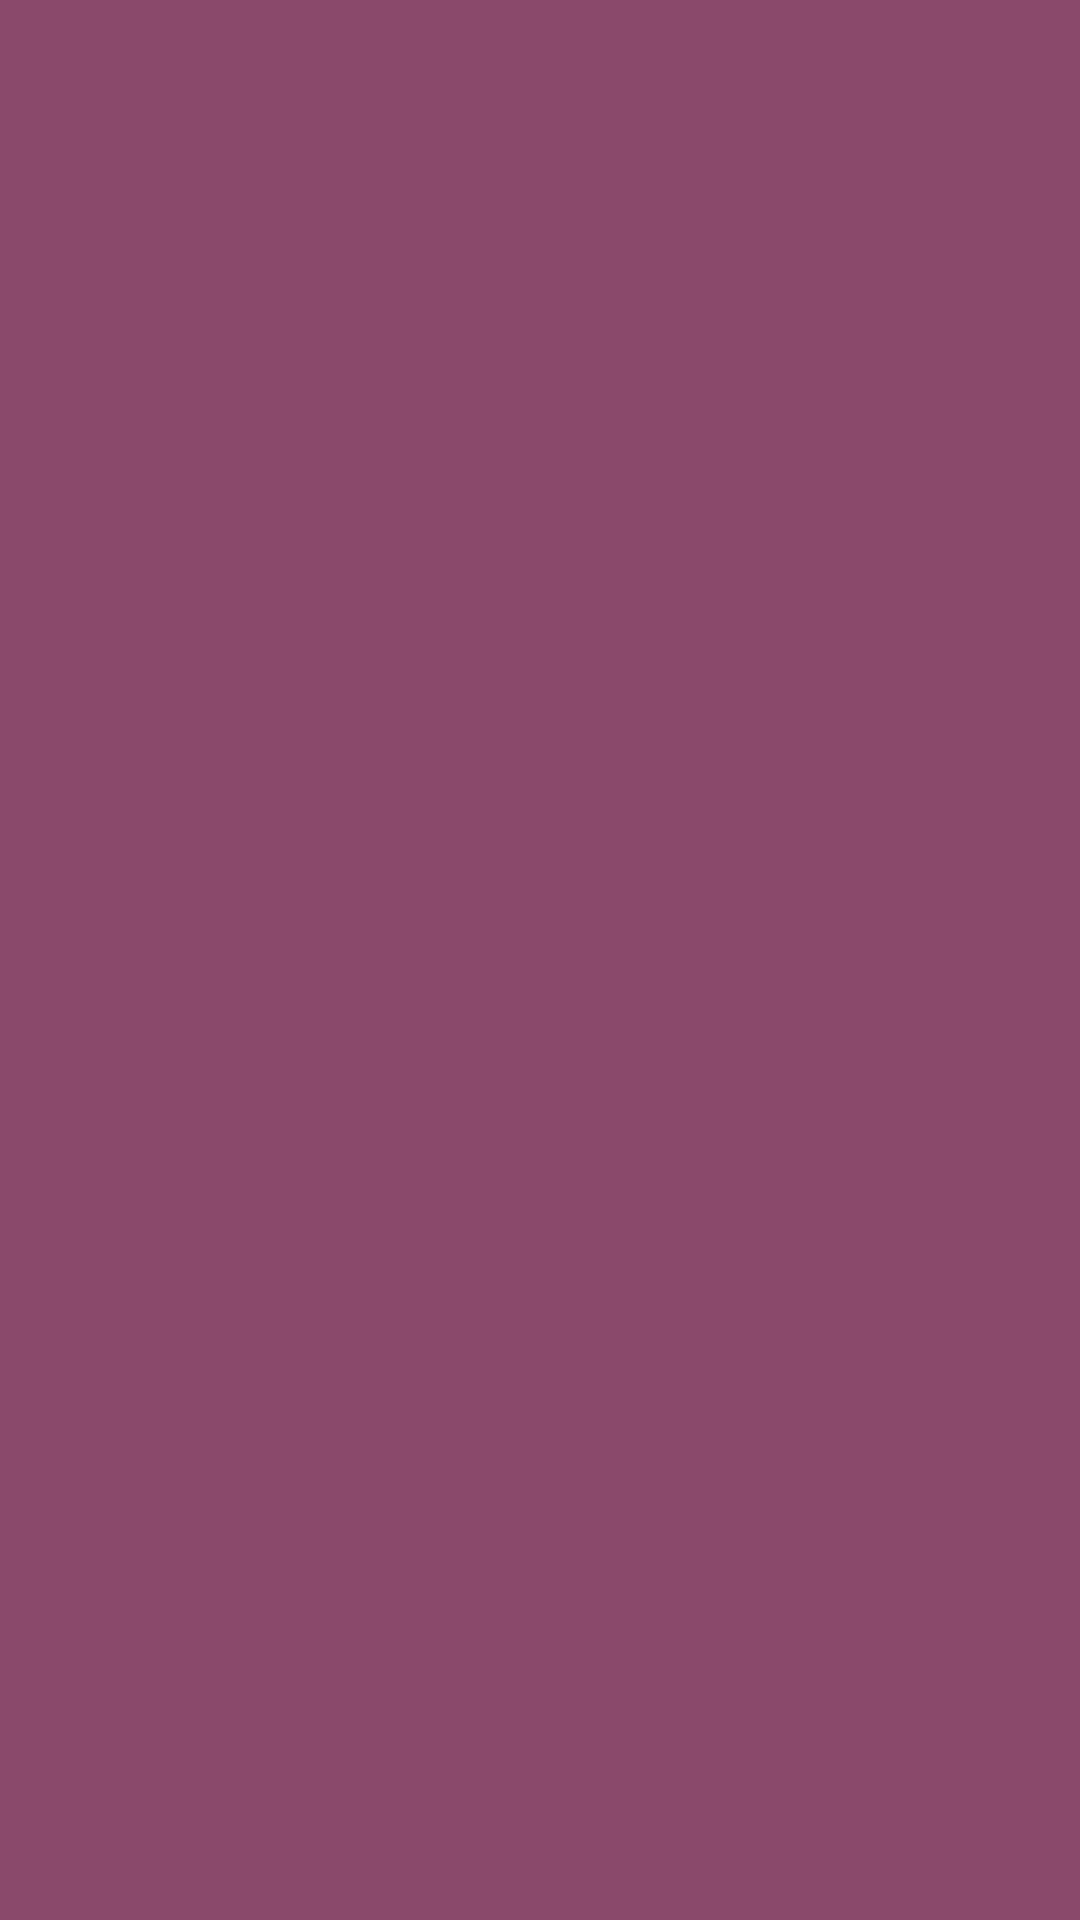 1080x1920 Twilight Lavender Solid Color Background